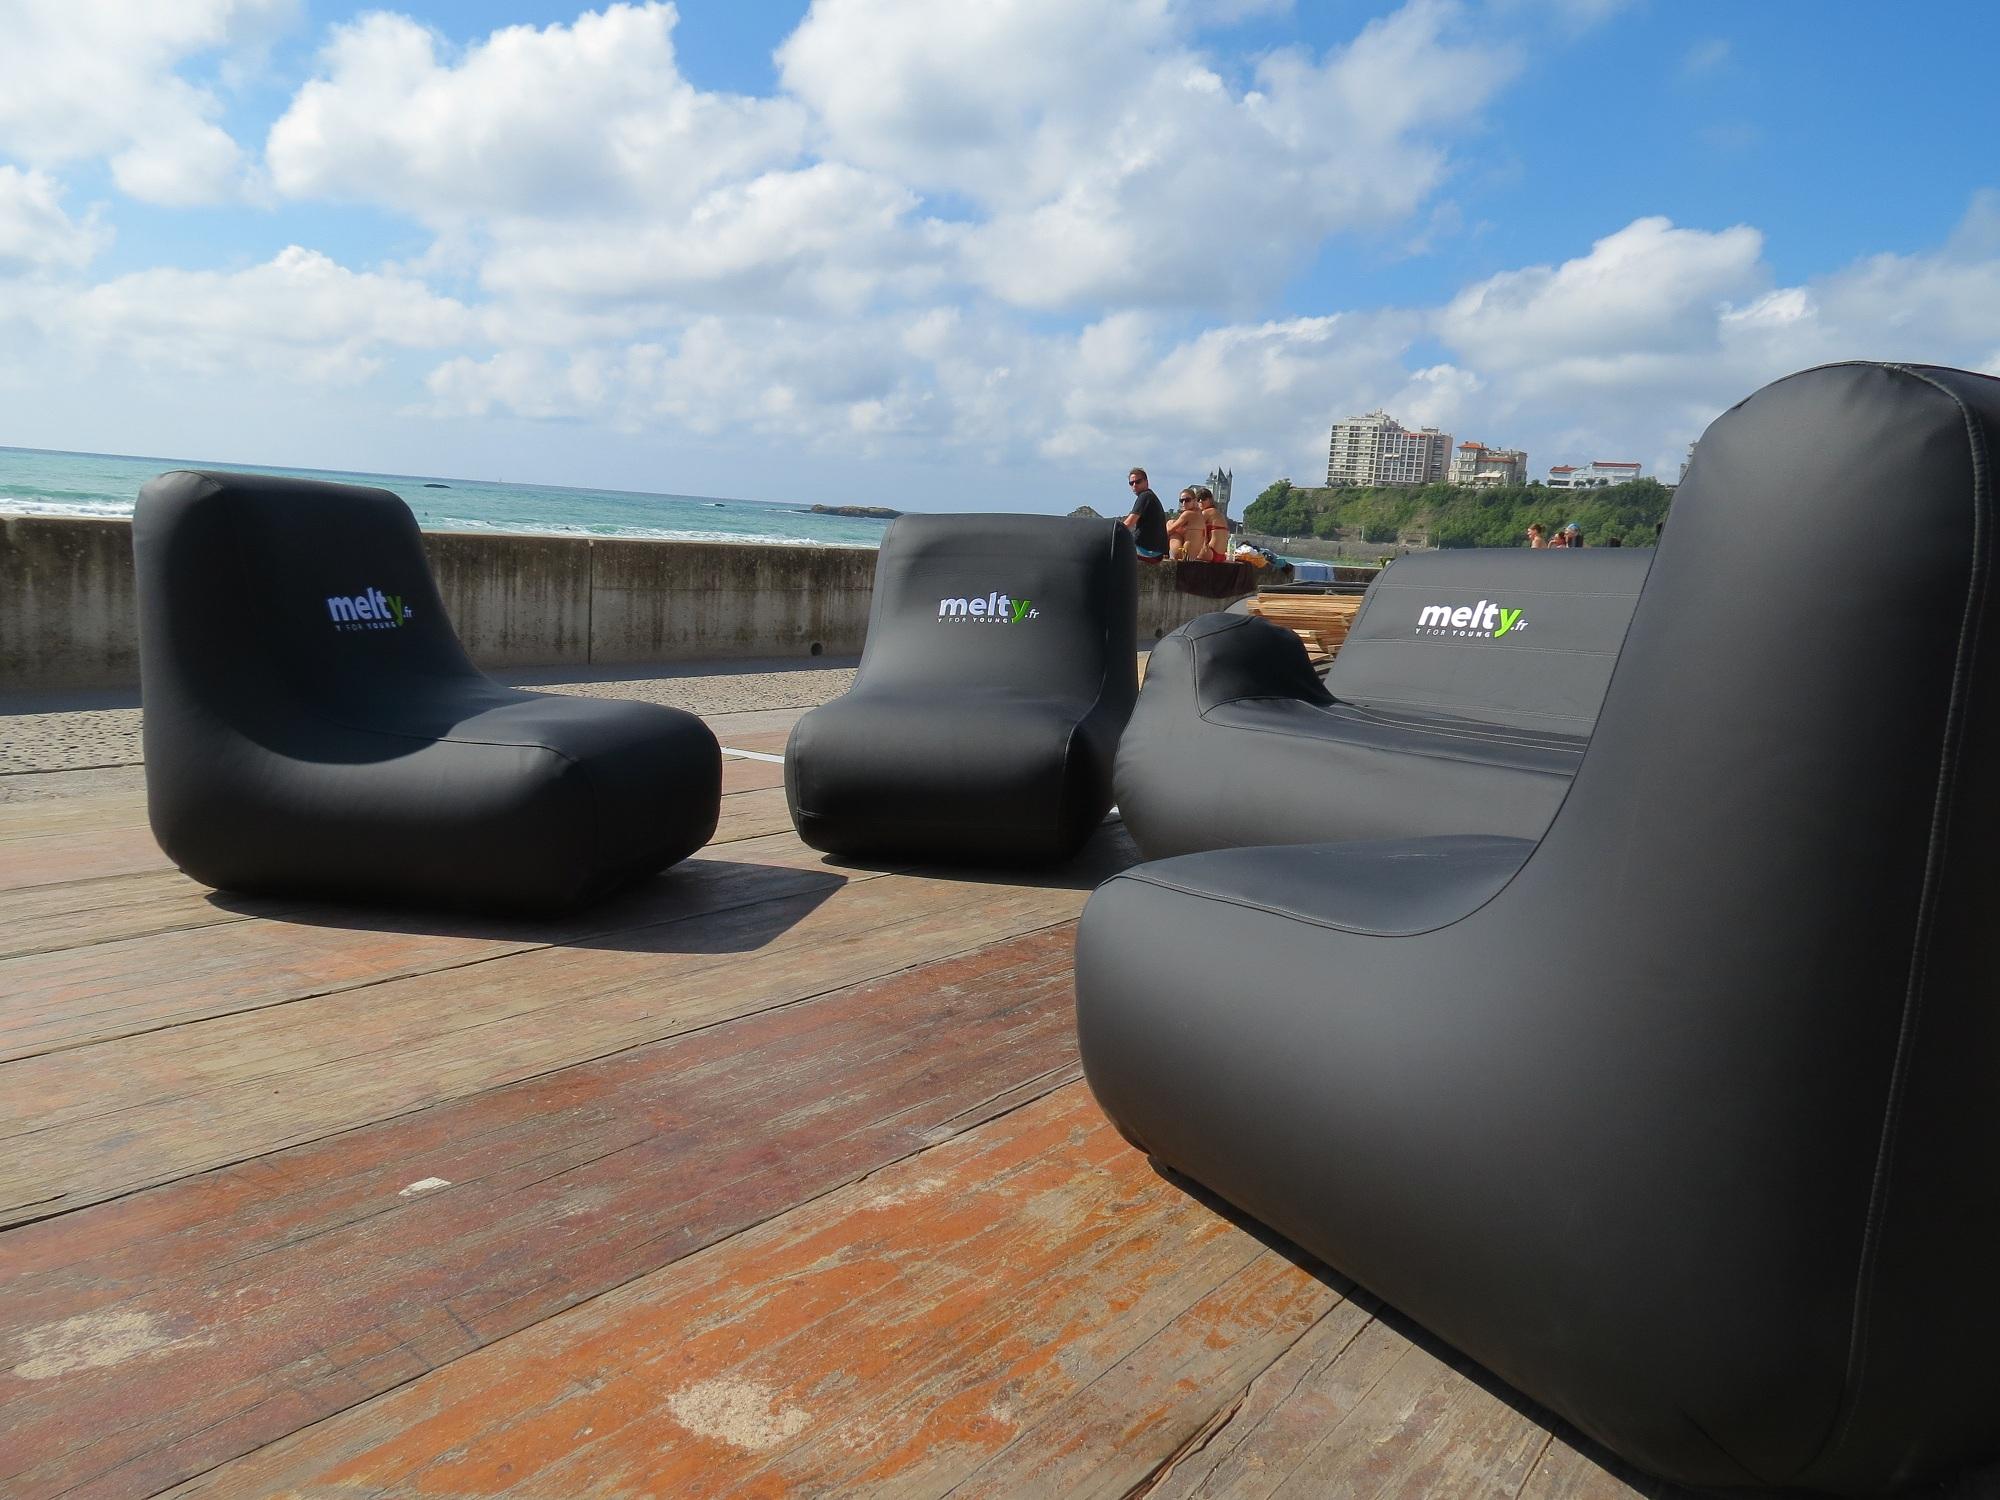 melty mobilier gonflable unc pro. Black Bedroom Furniture Sets. Home Design Ideas